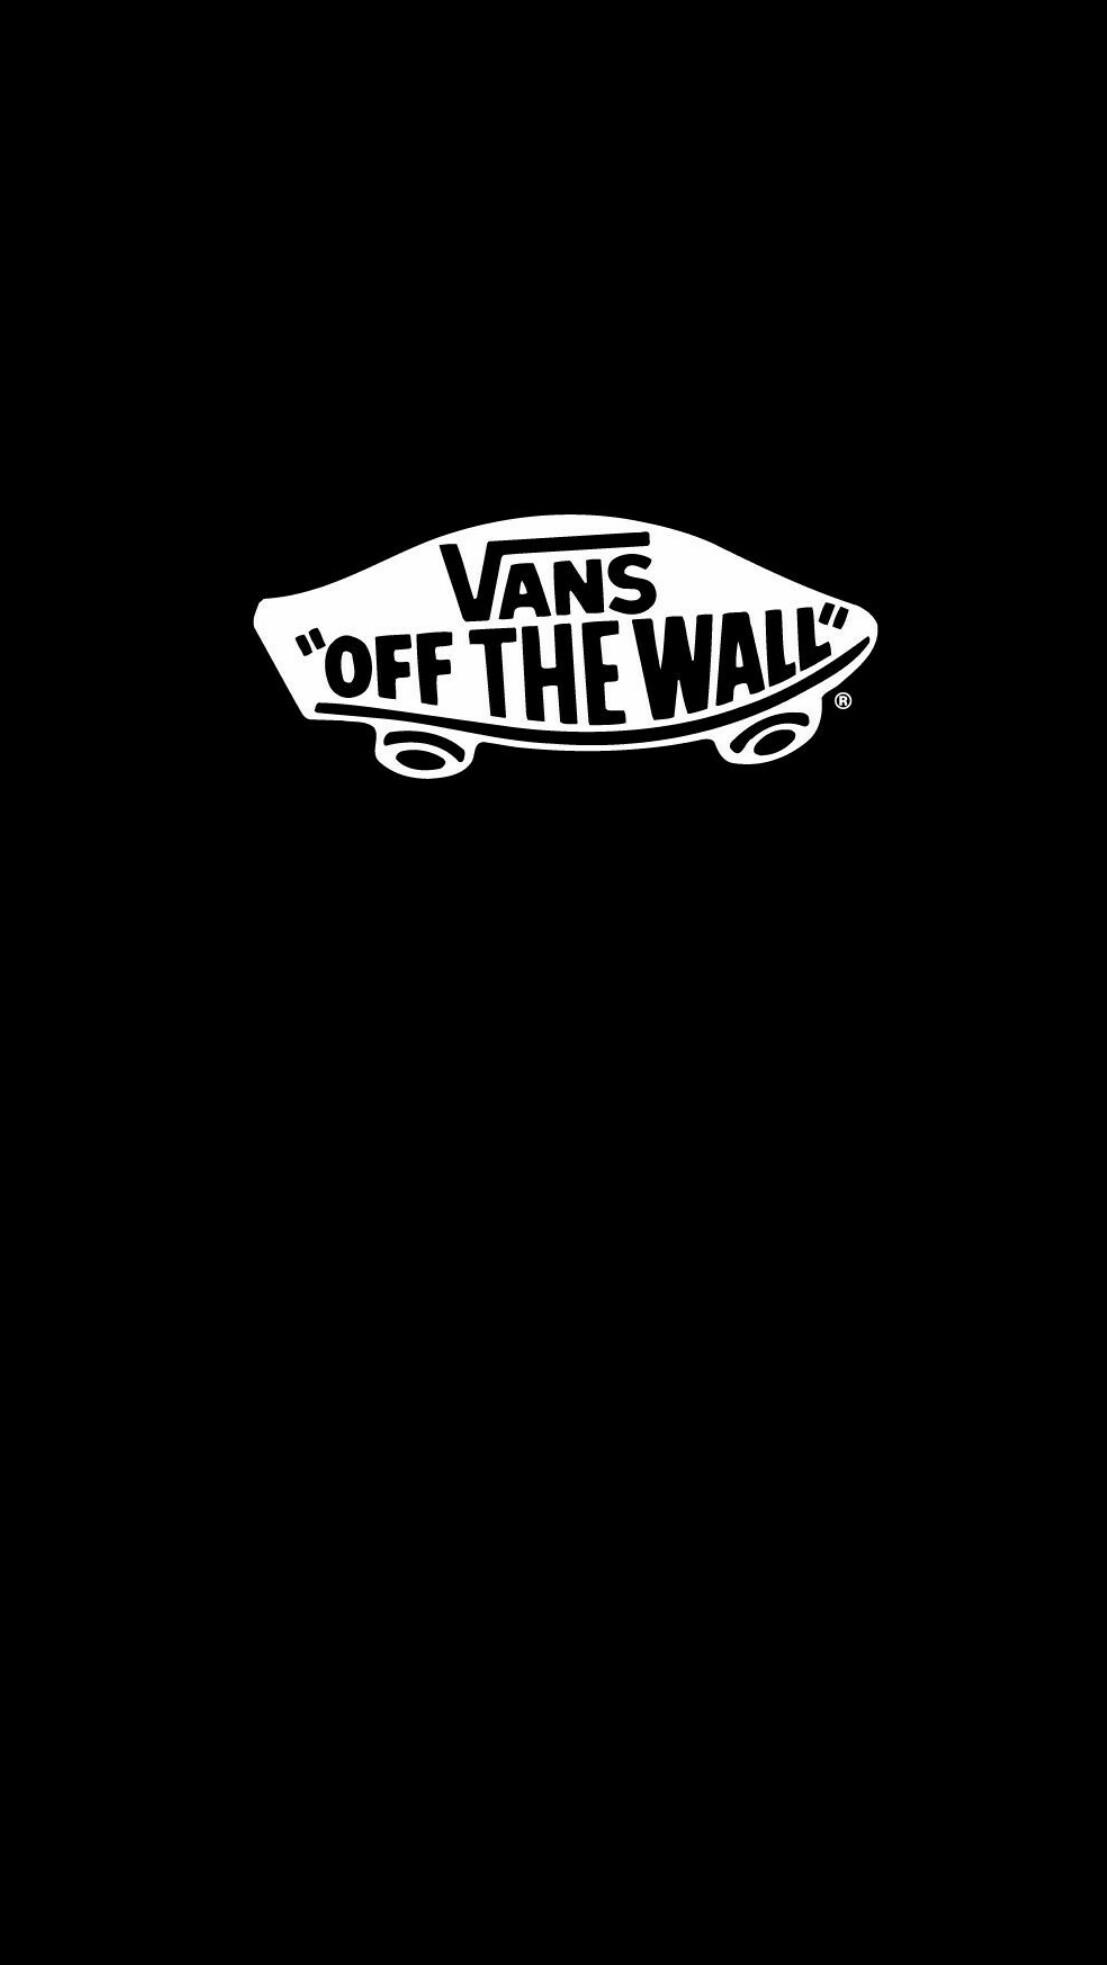 #vans #black #wallpaper #iPhone #android